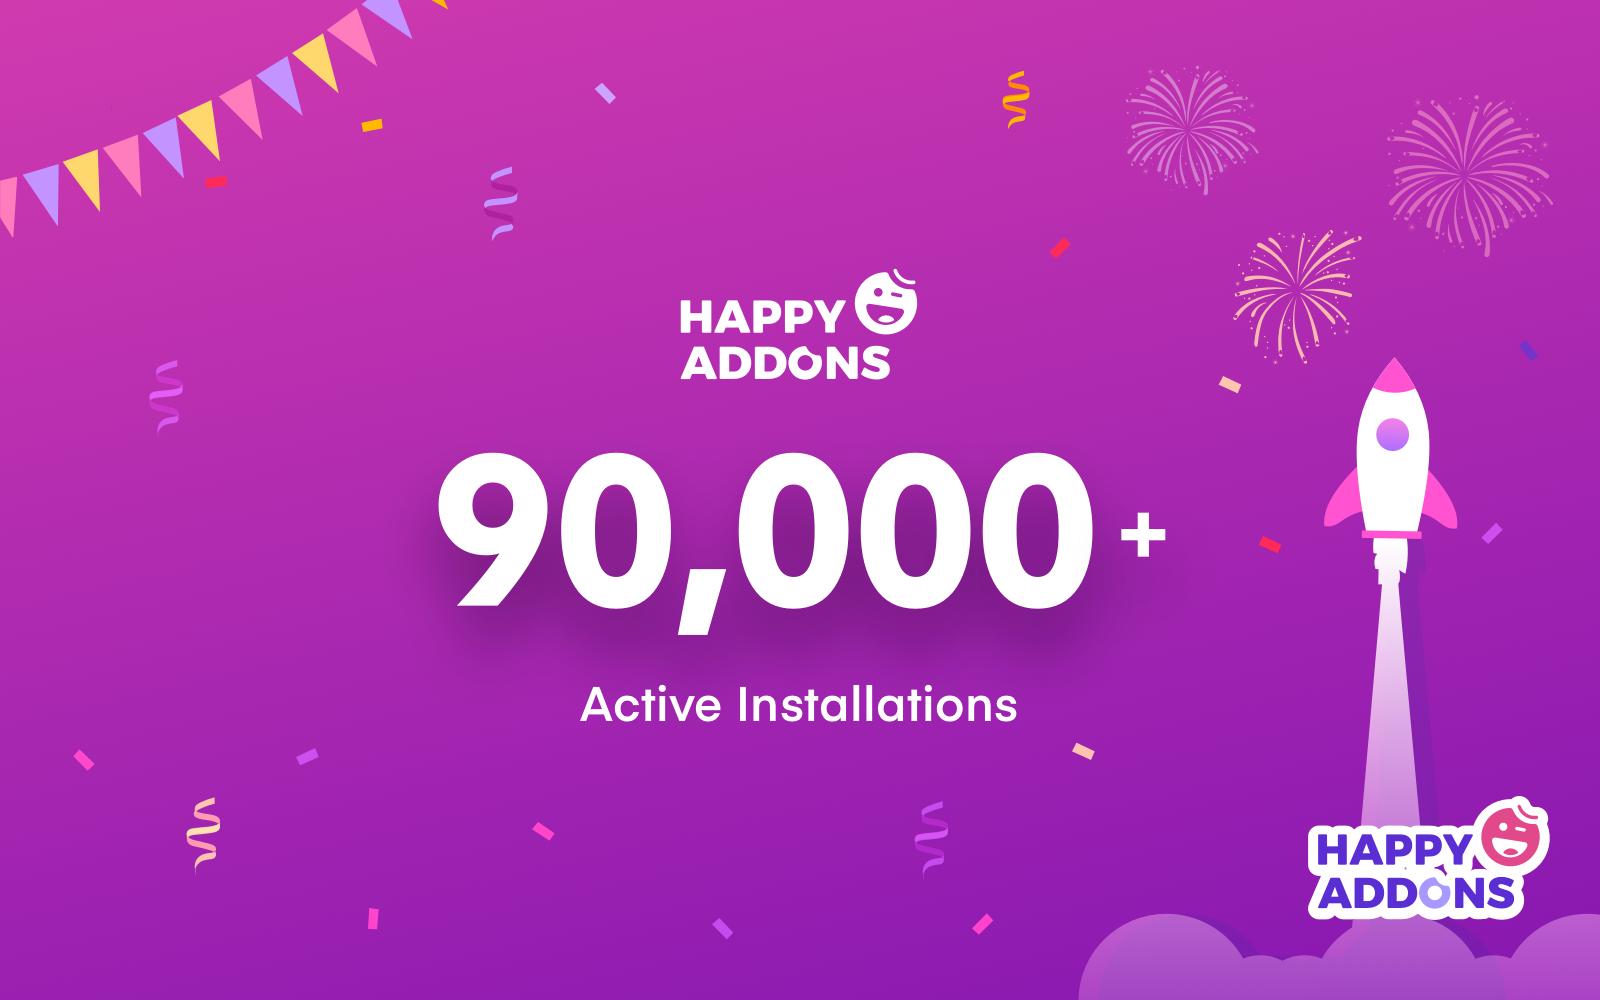 happy-addons-active-installations